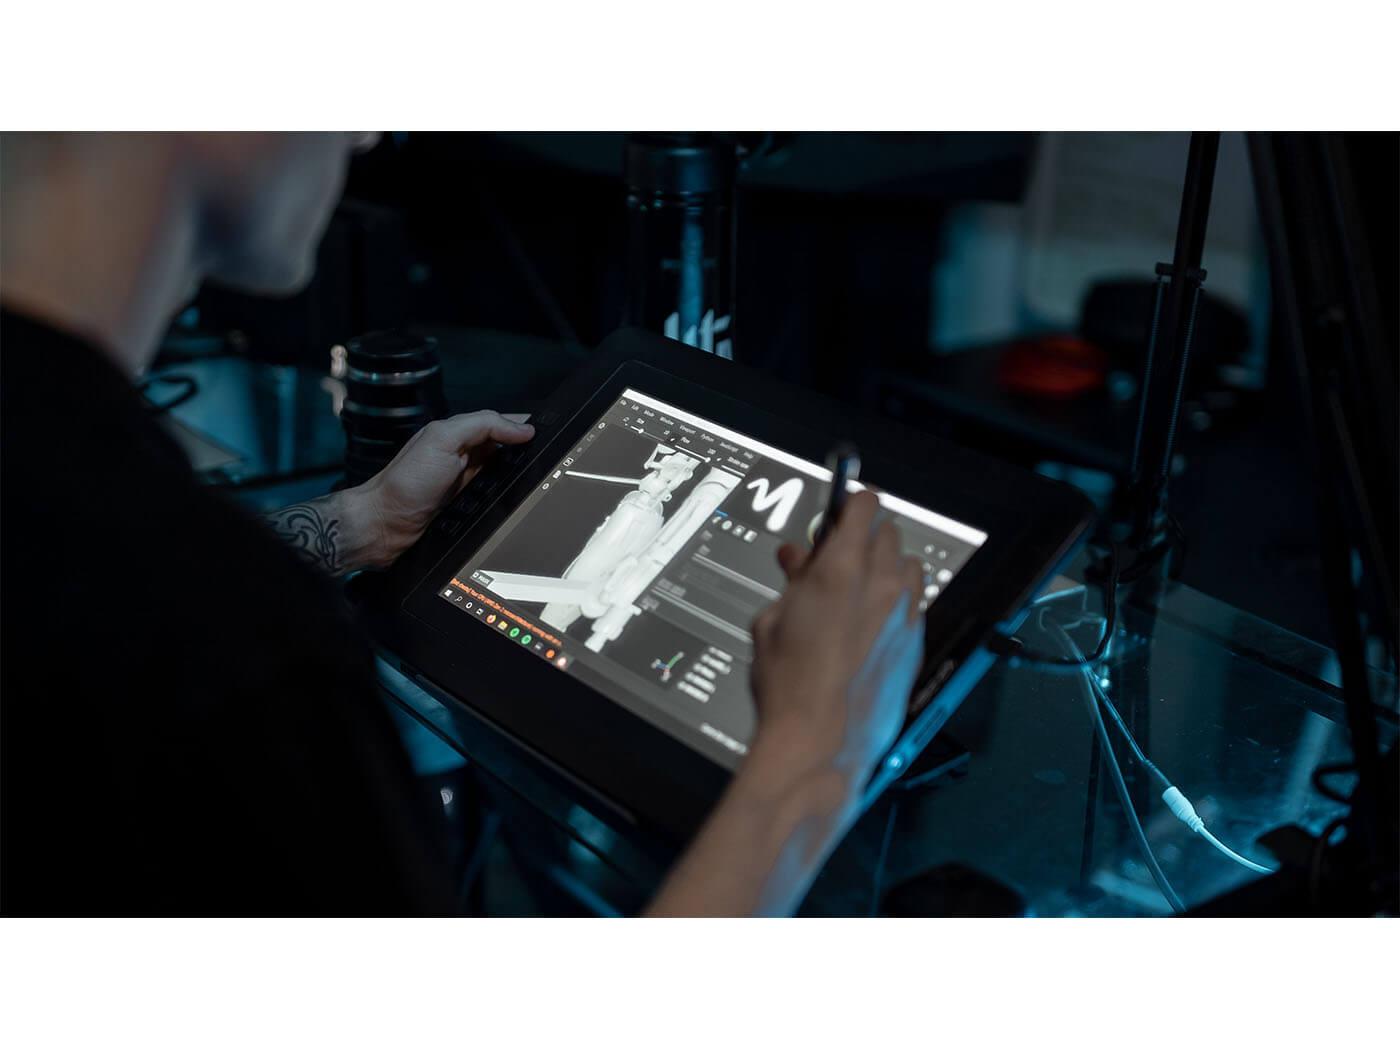 Levitate Studio Show Off Your Studio Tablet